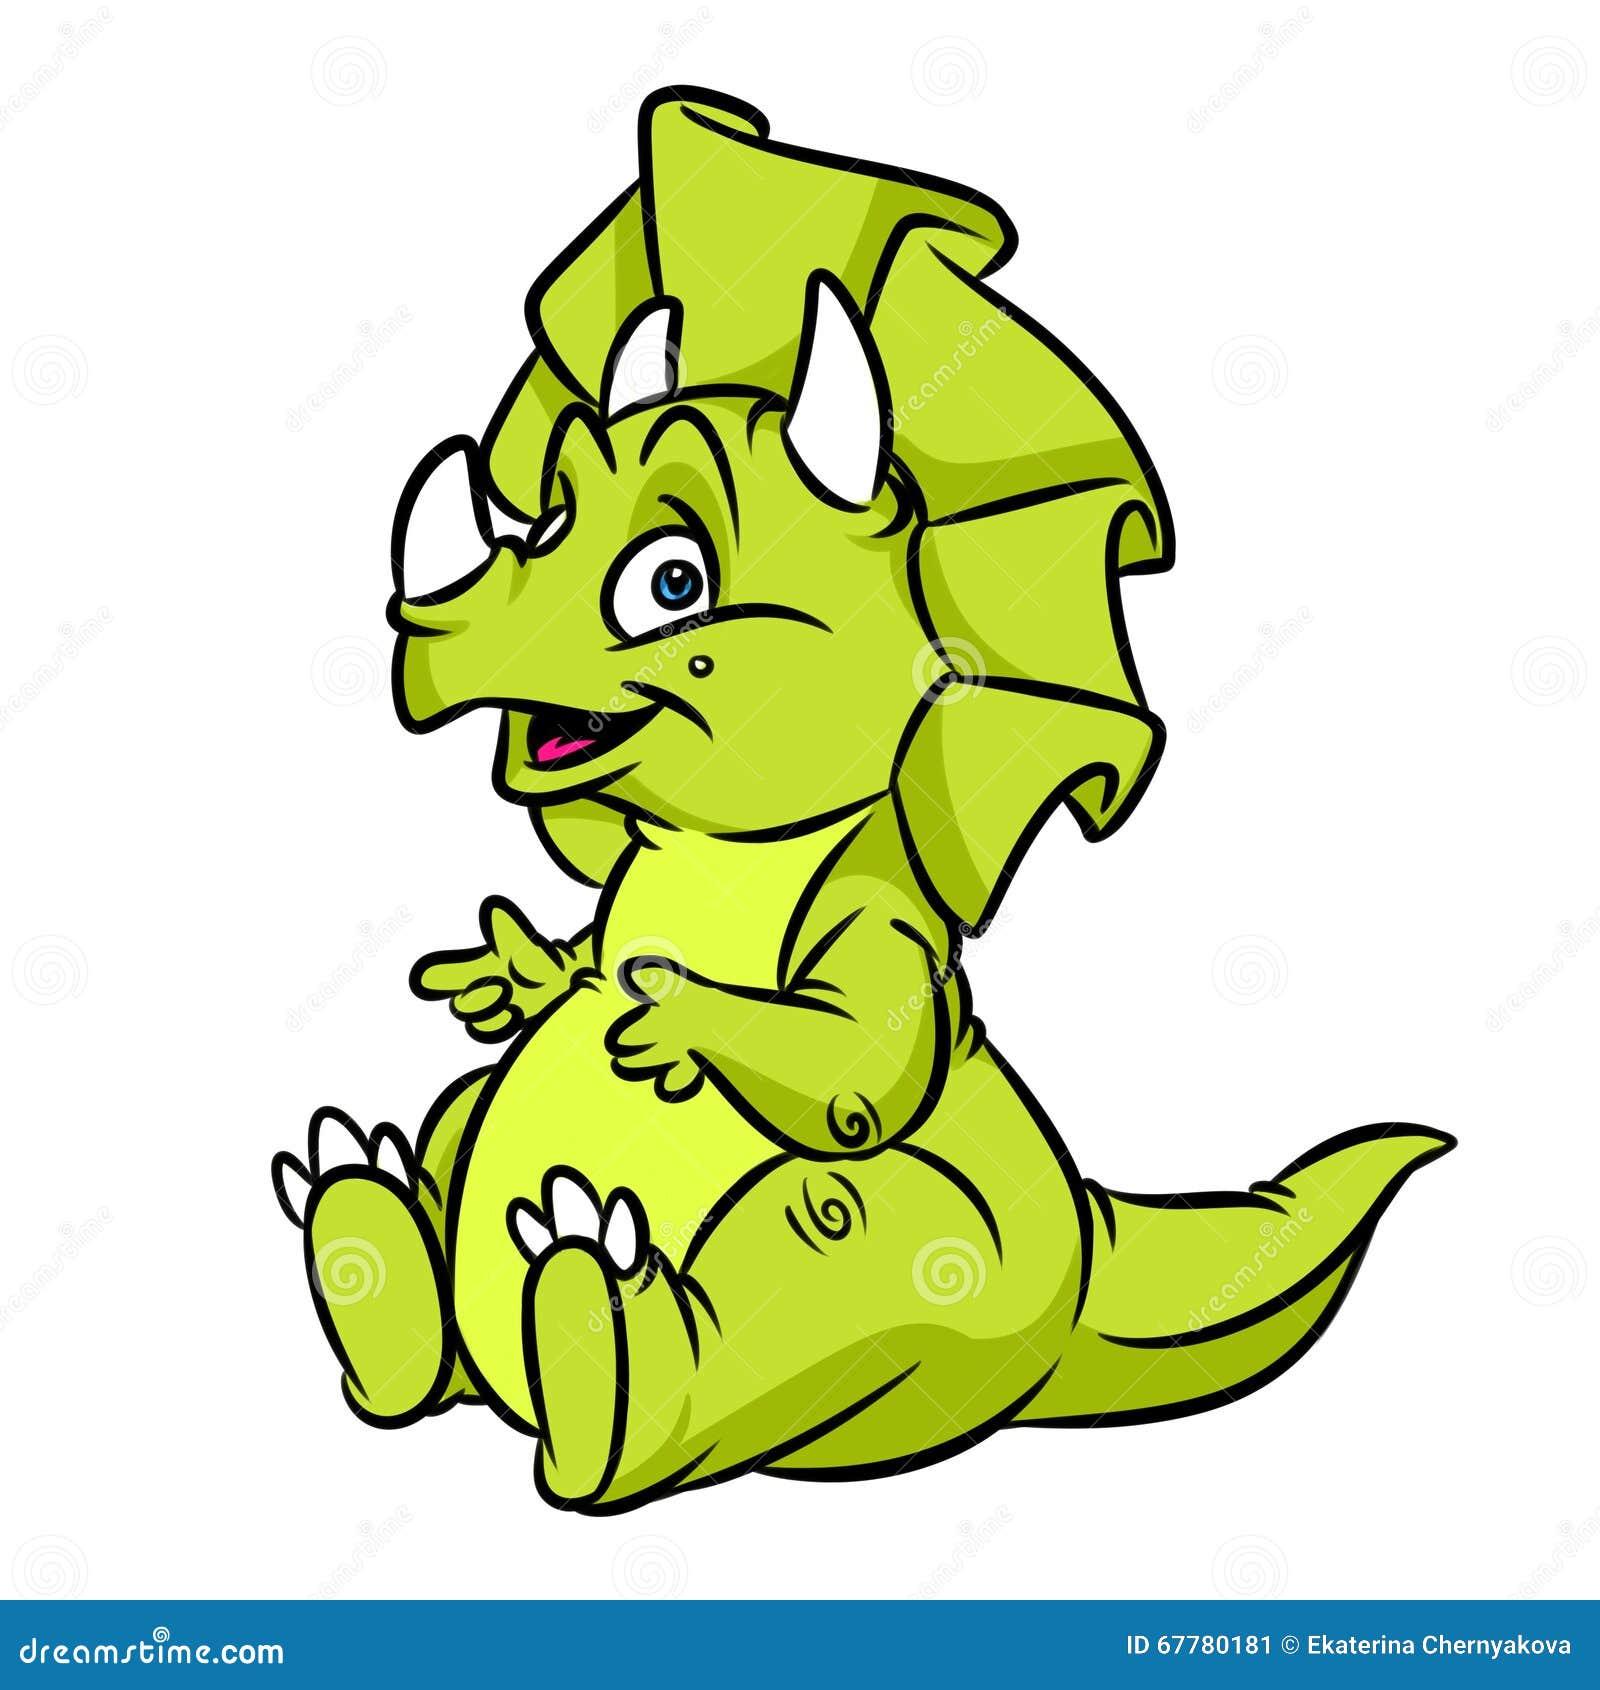 A Cartoon Character That Is Green : Cartoon illustration of triceratops dinosaur vector